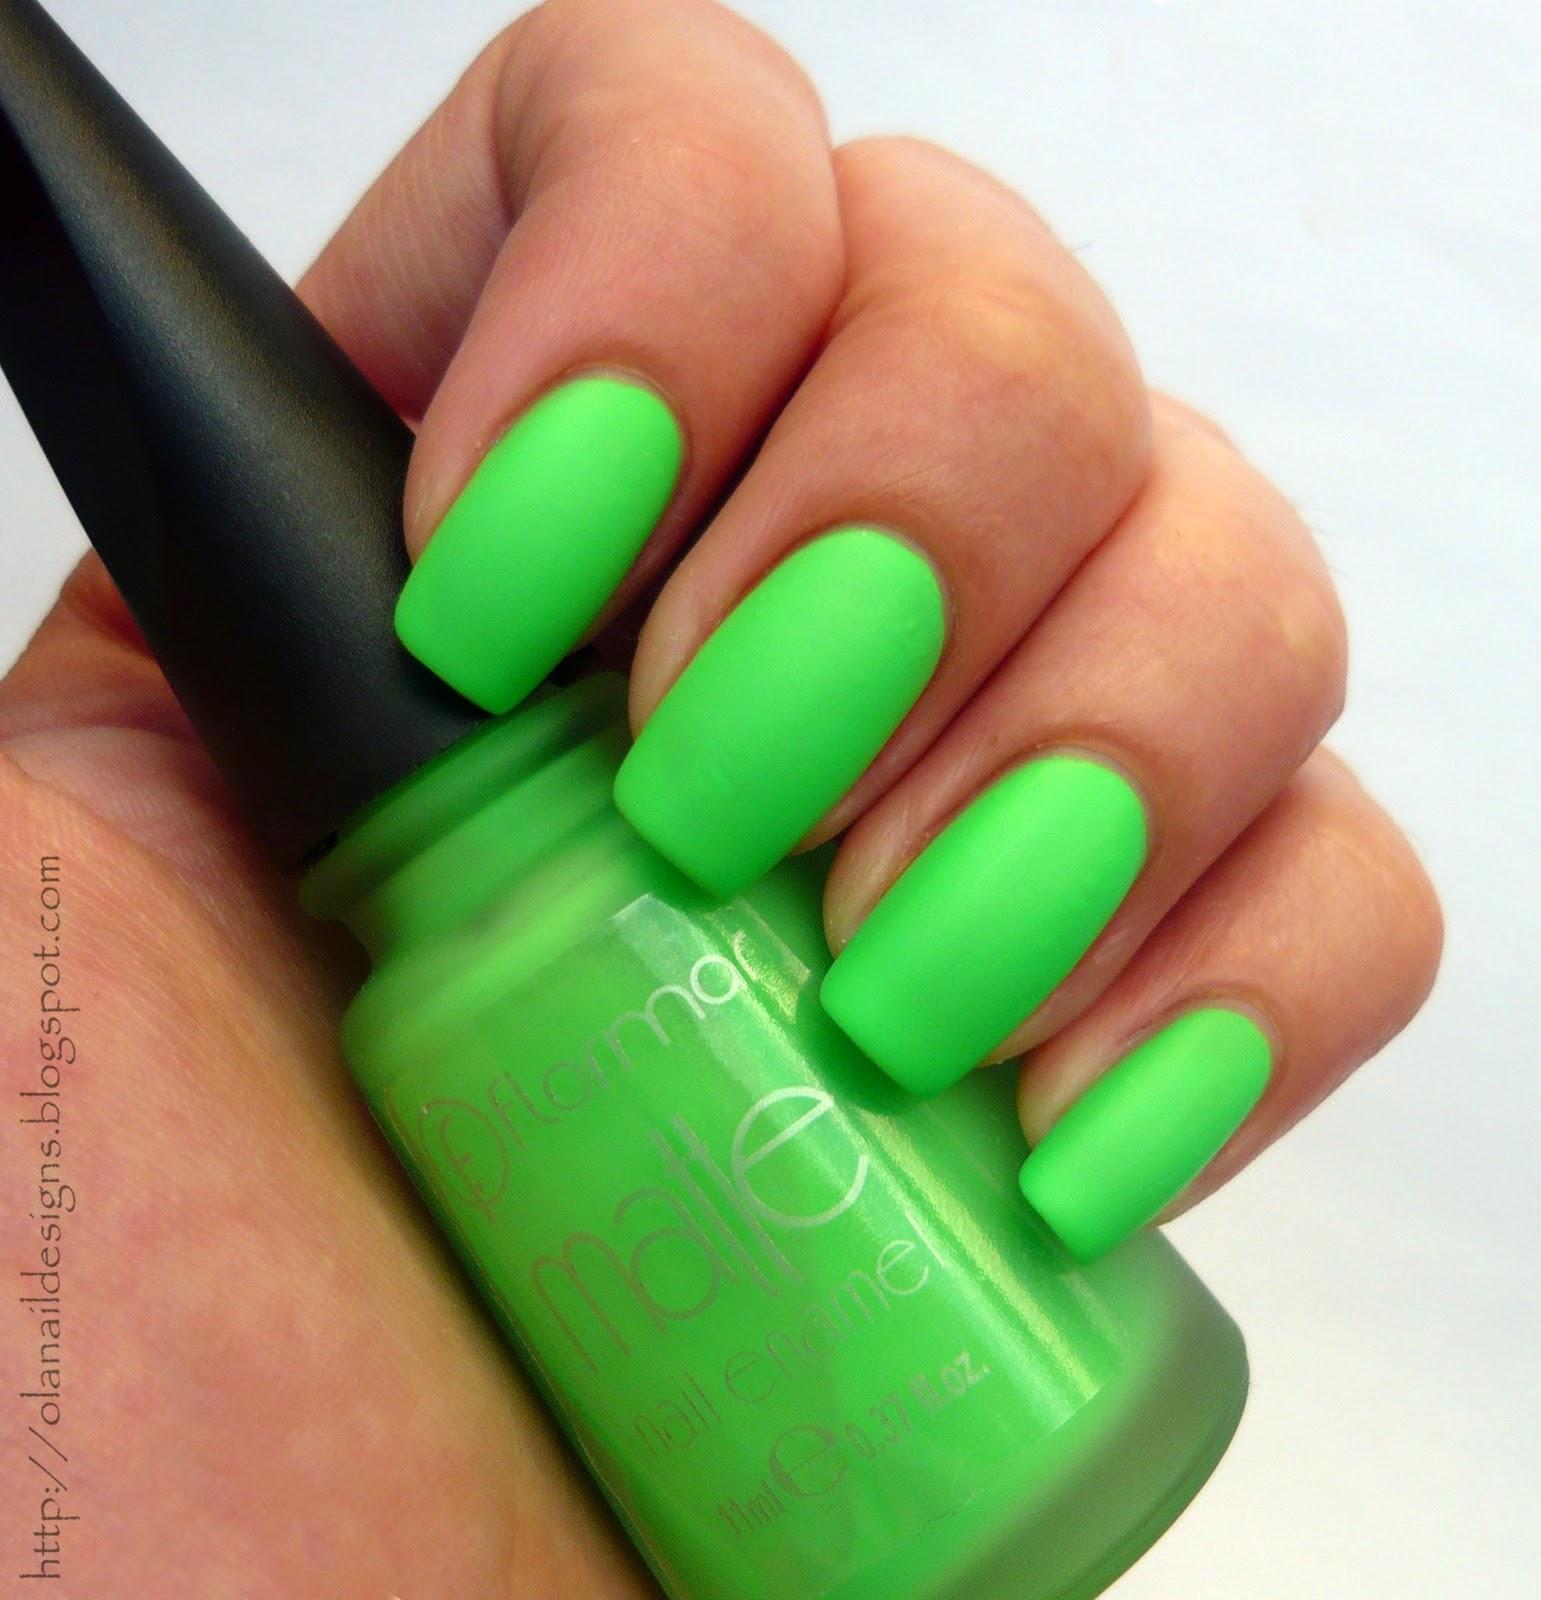 neonowe matowe zielone paznokcie